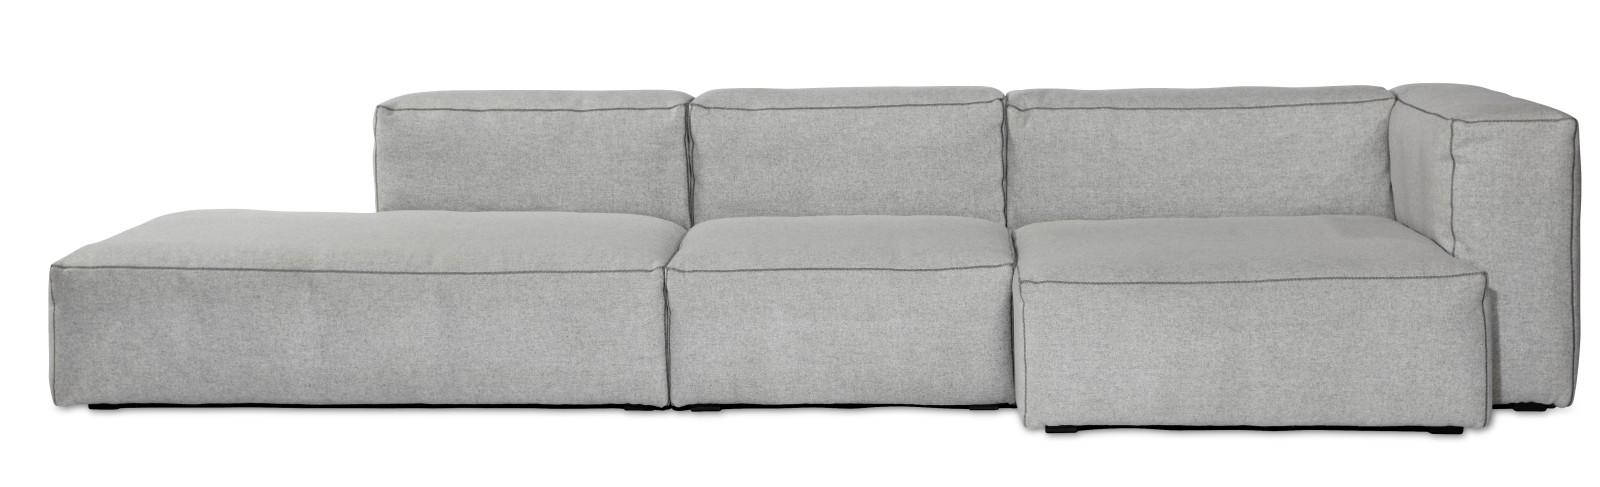 Mags Chaise Lounge Soft Modular Element S8162 - Left Divina Melange 2 120